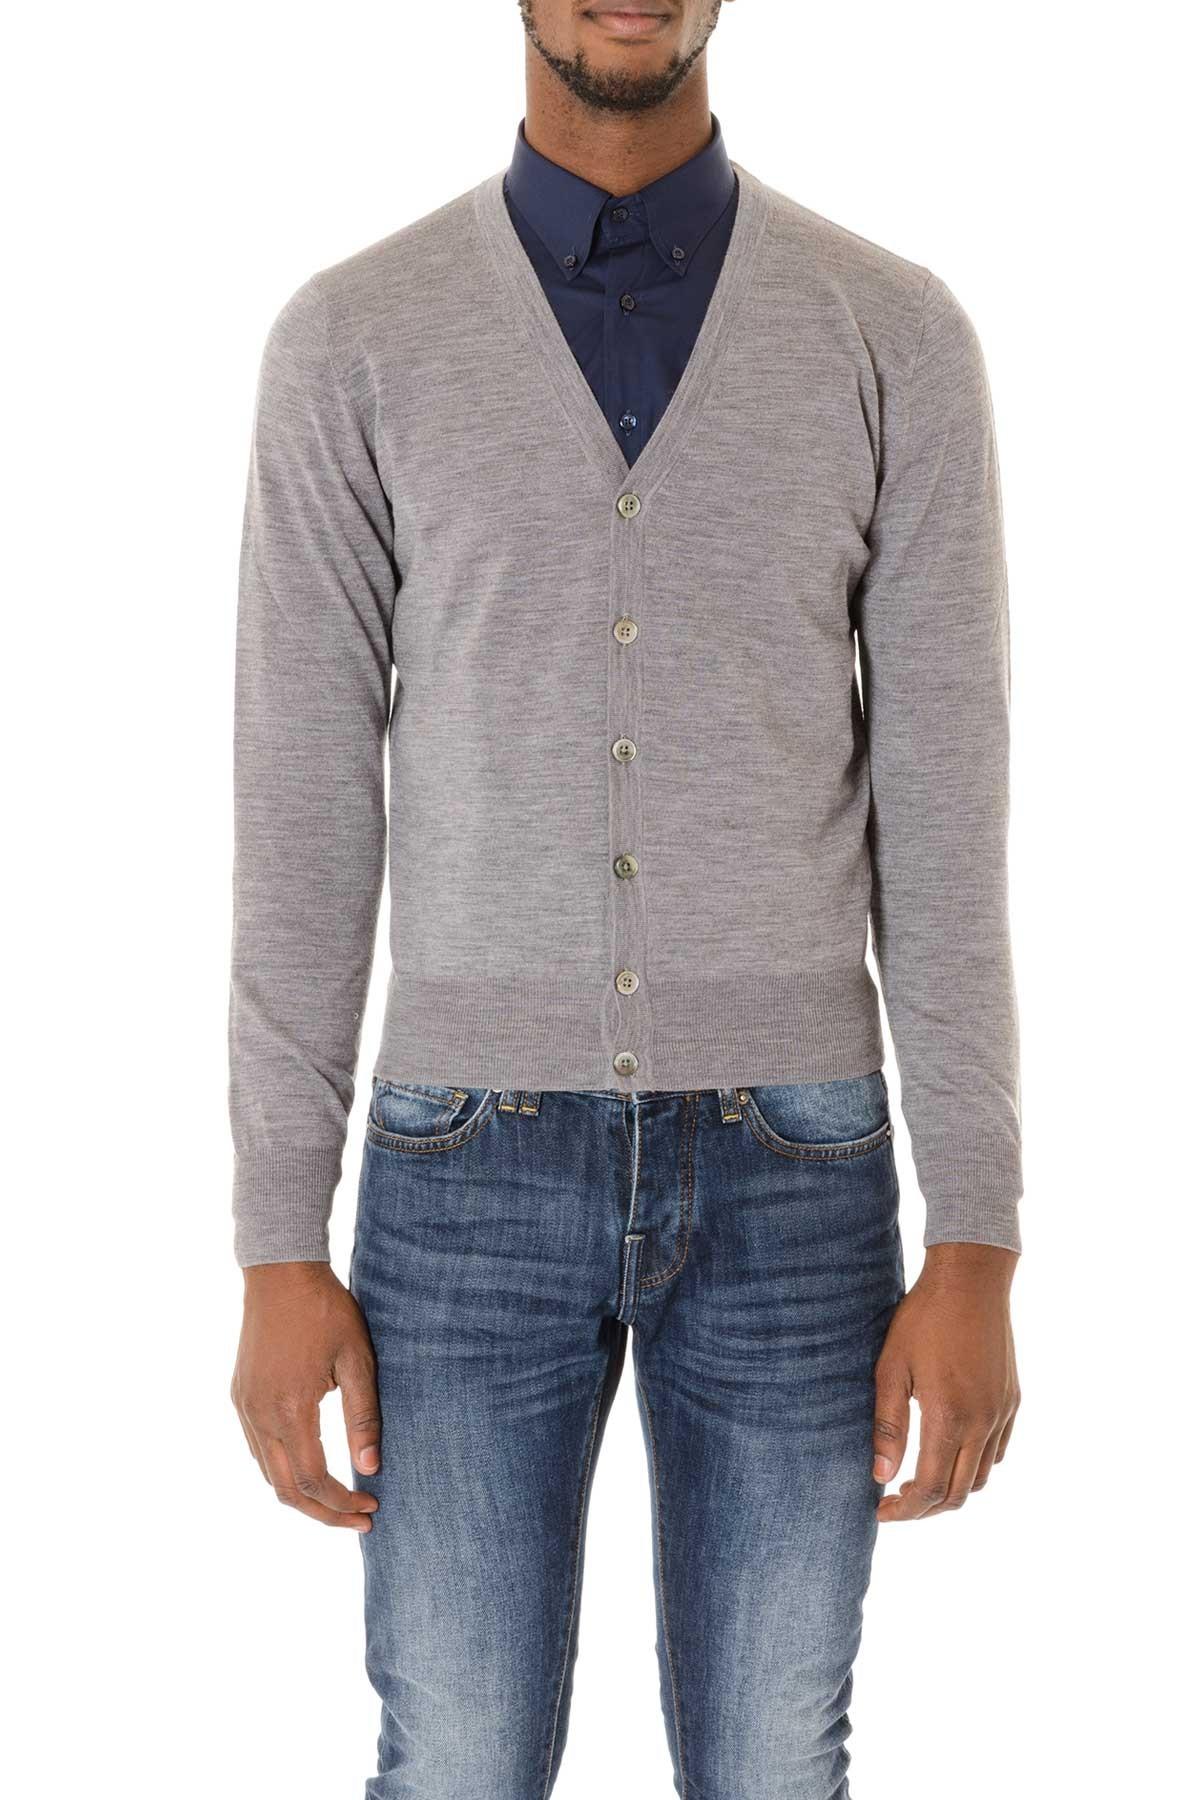 Italian Restaurants Cardigan Sweater Vest